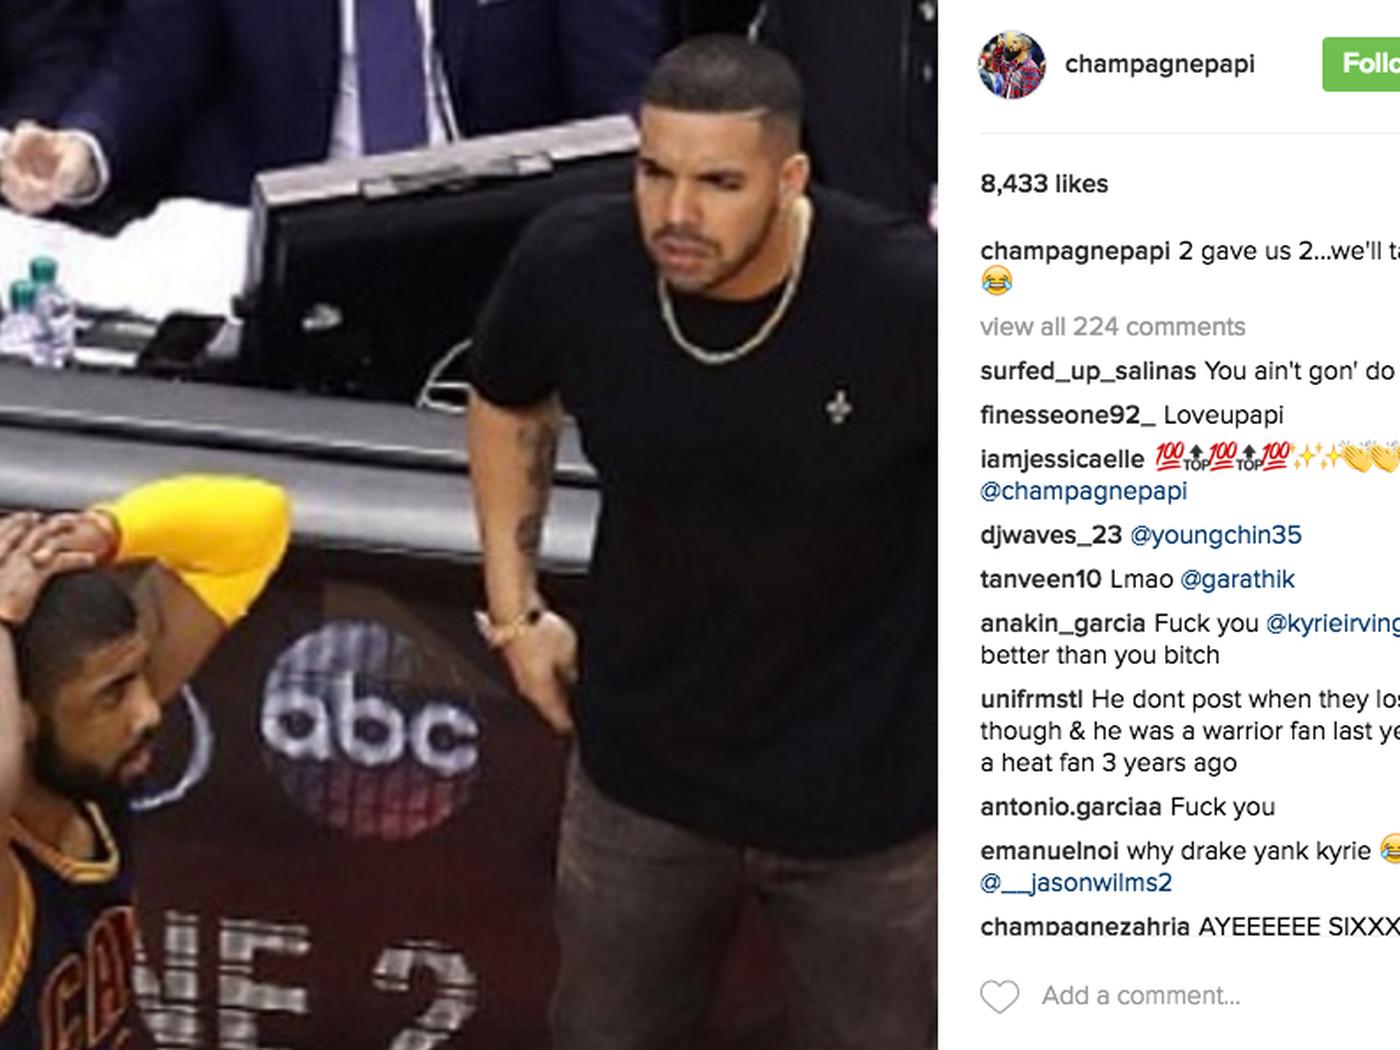 Drake is talking trash on his Instagram again after Raptors